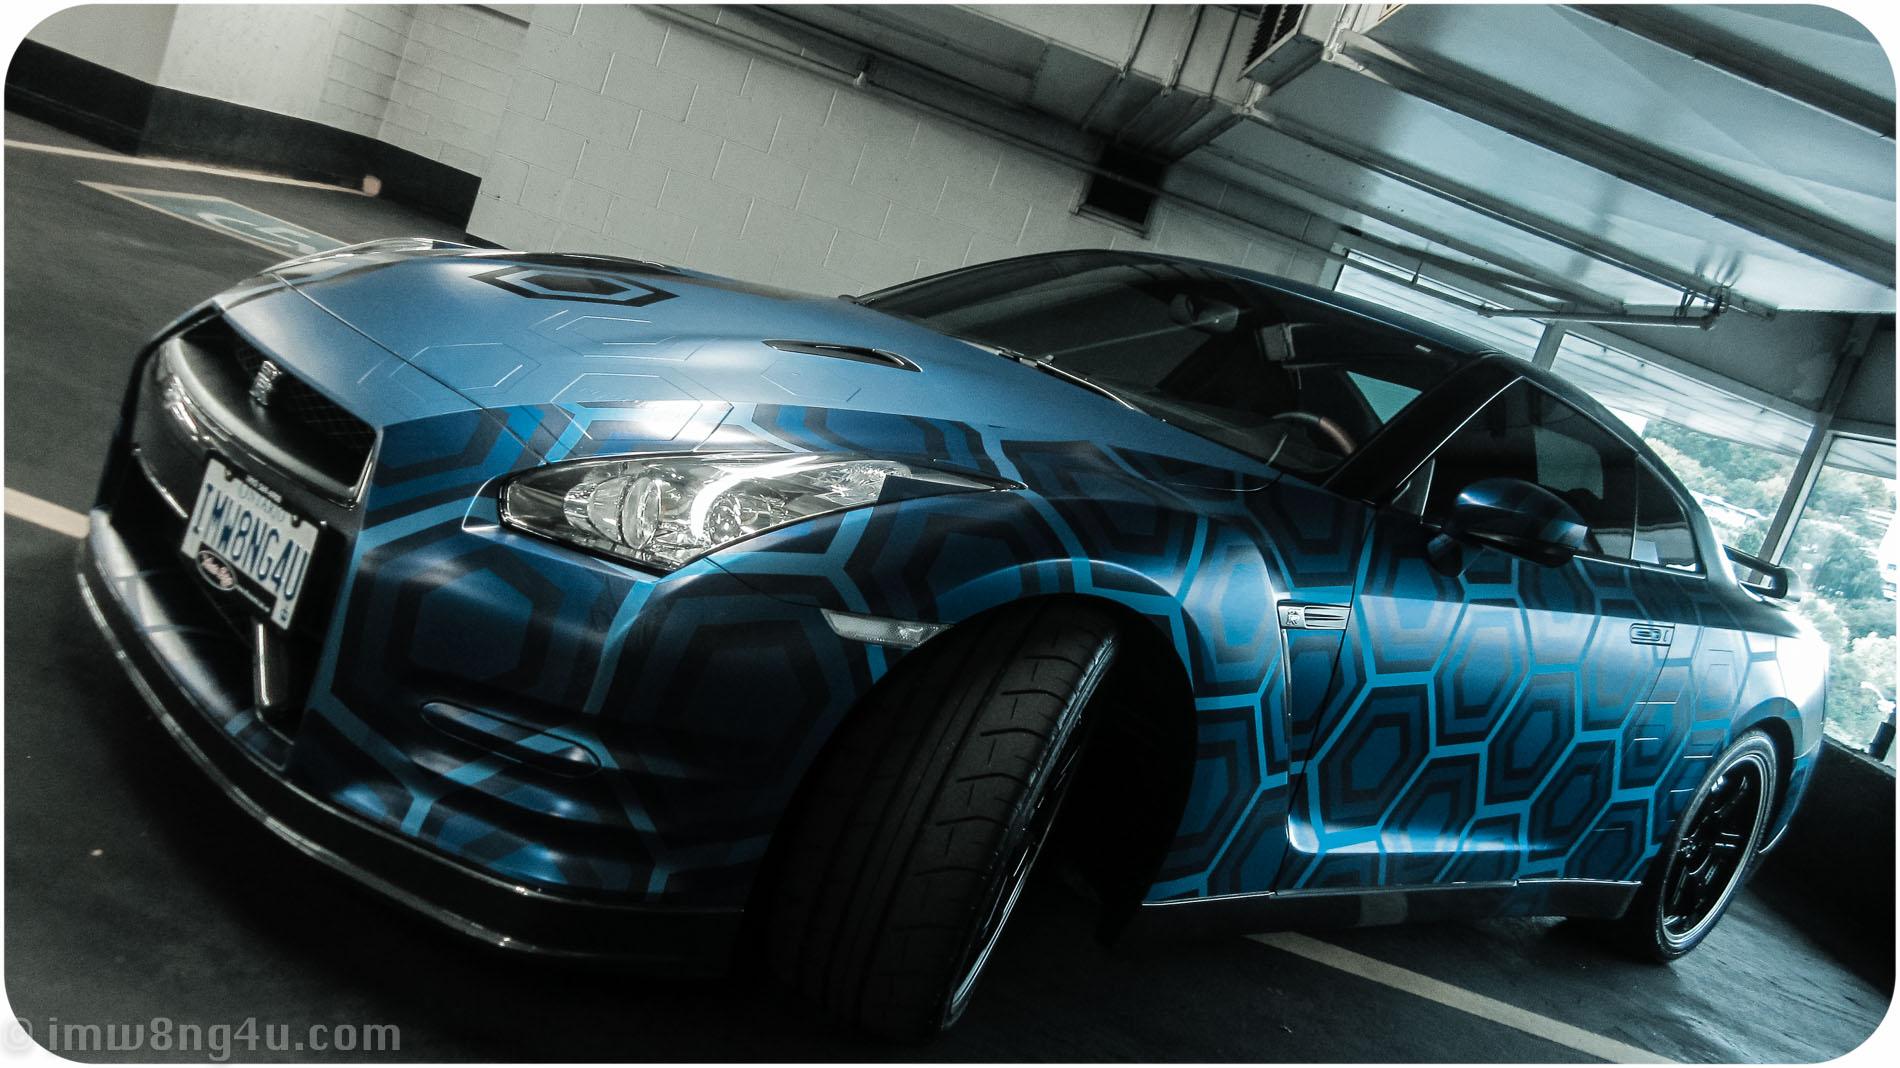 Nissan Gtr Concept >> The Next Craze In Supercar Wraps: 3D Effects?